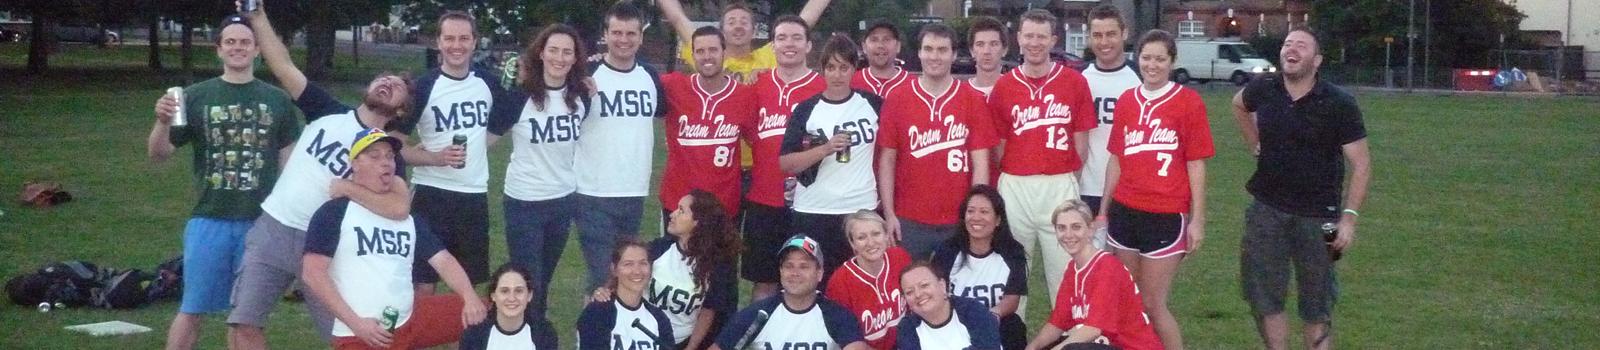 softball team 350